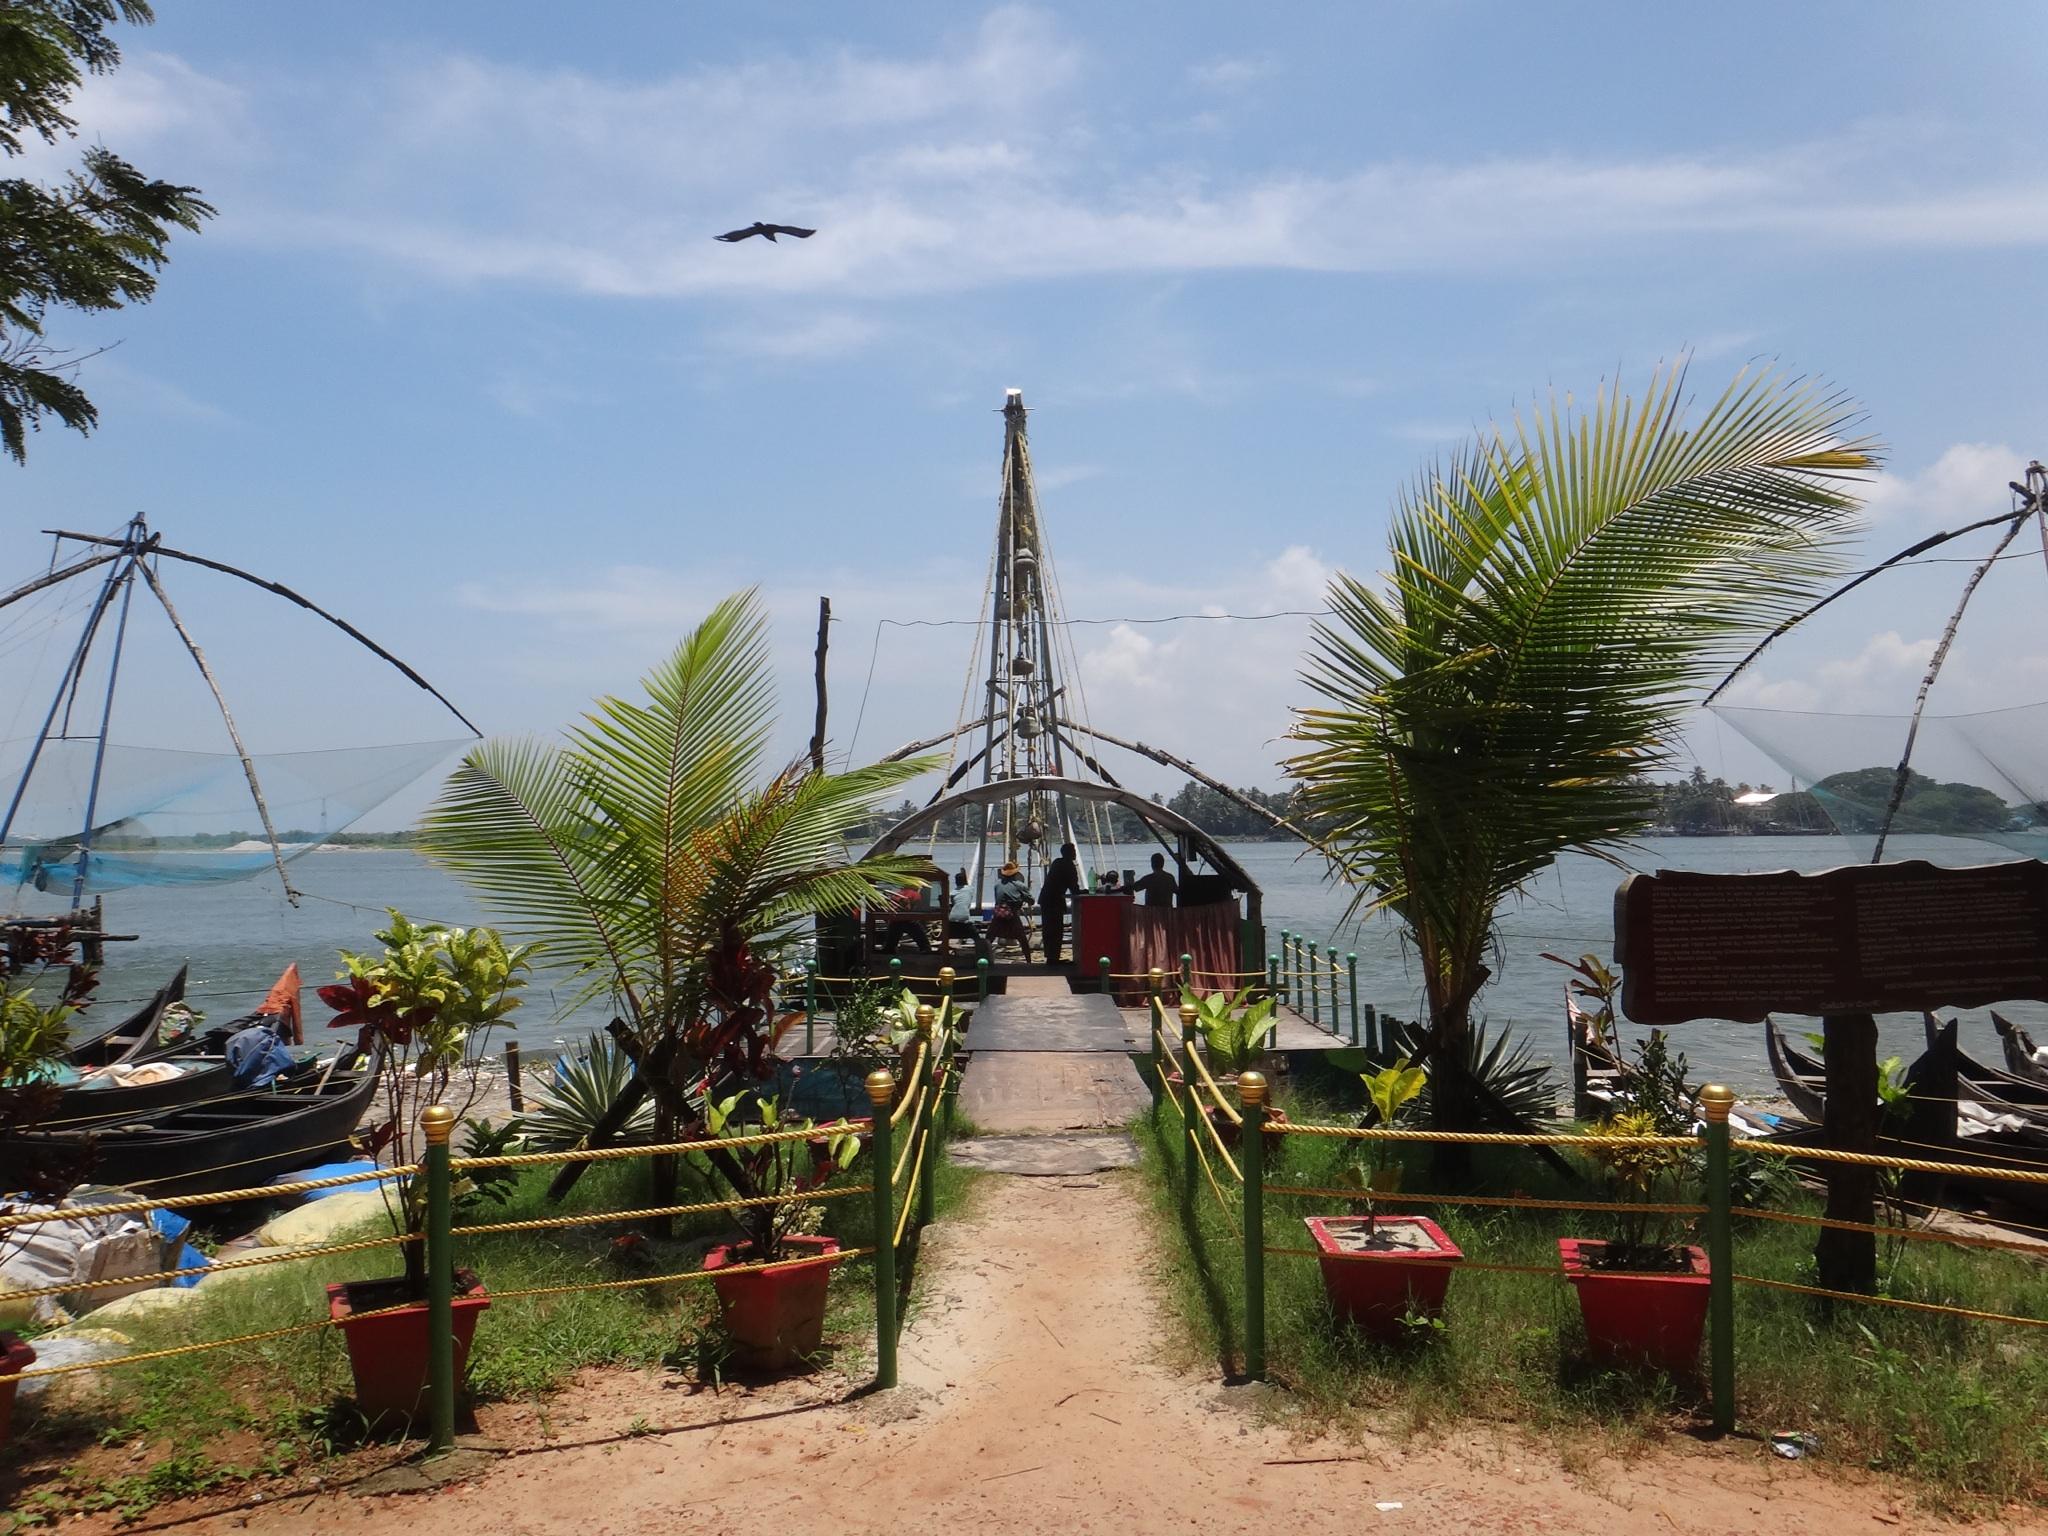 fisherman - kochi - kerala - india